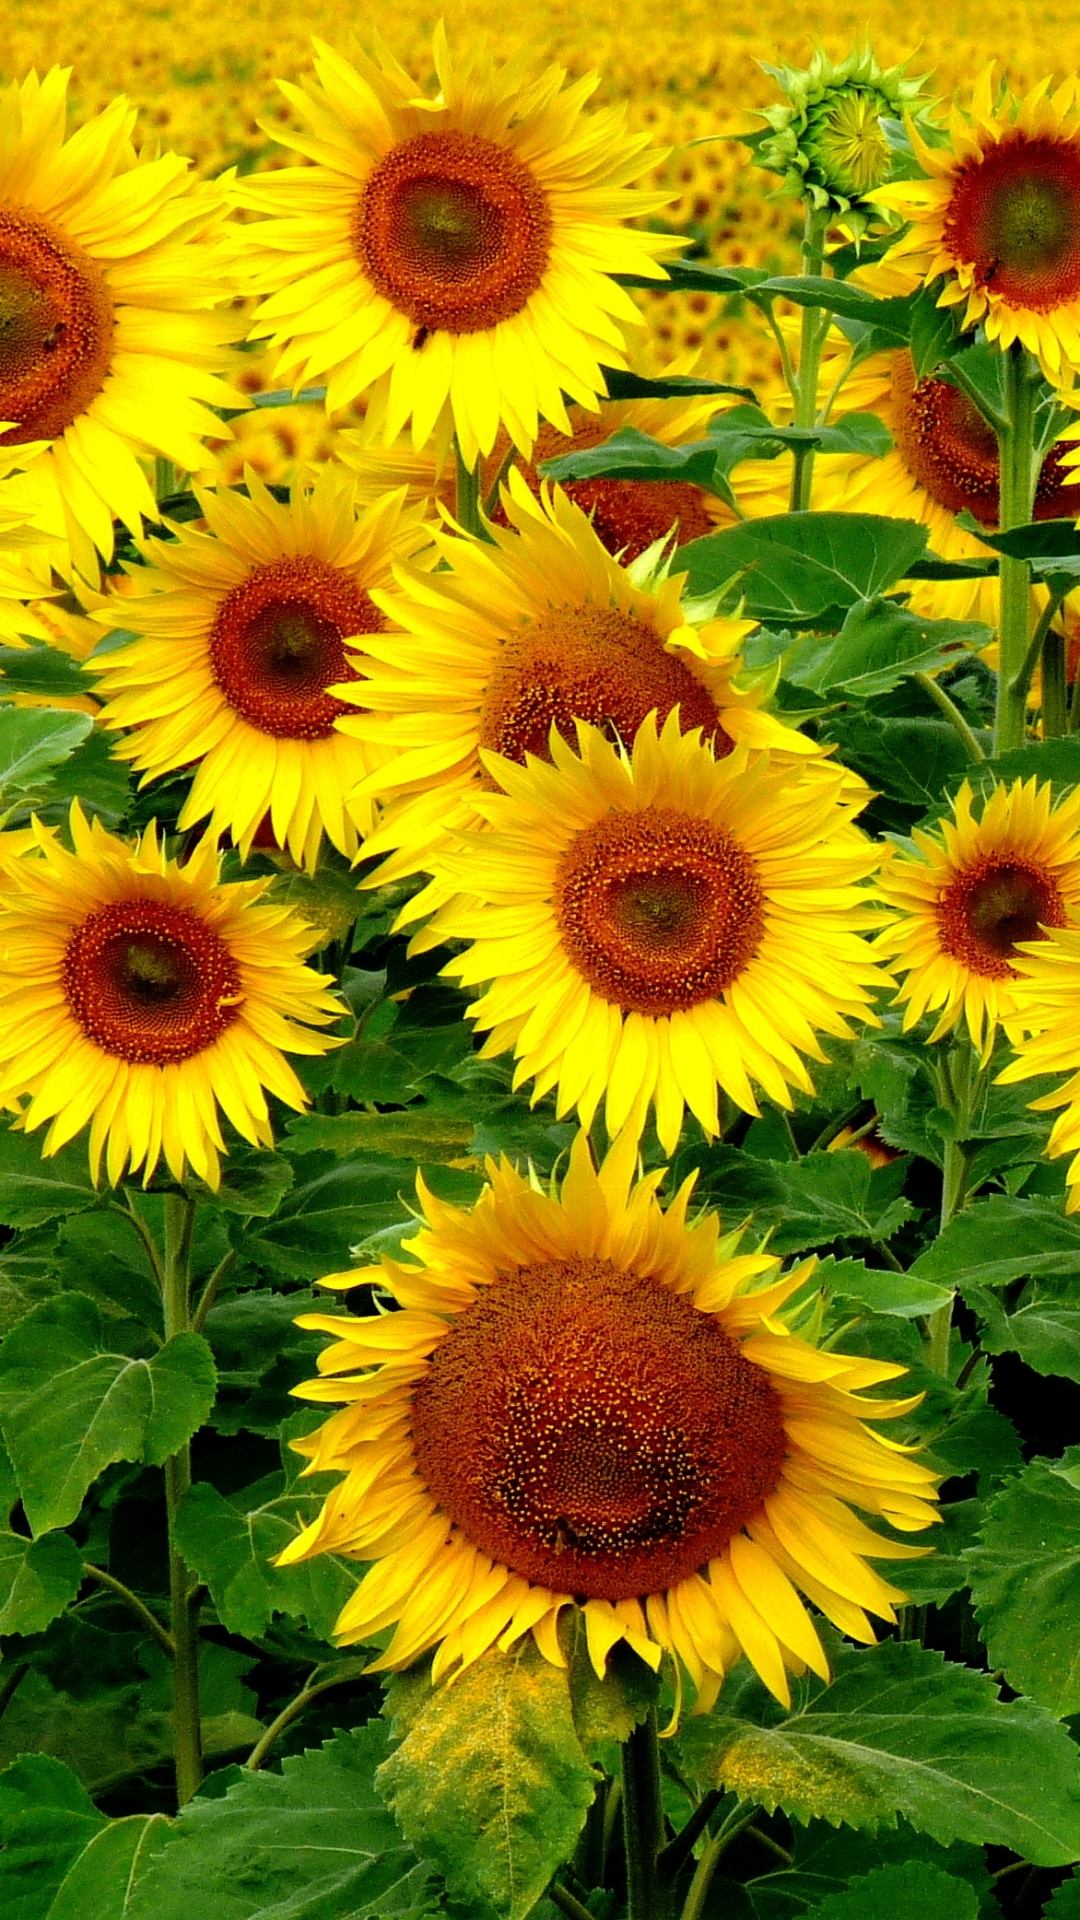 sunflower wallpaper iphone 6 wallpaper sportstle